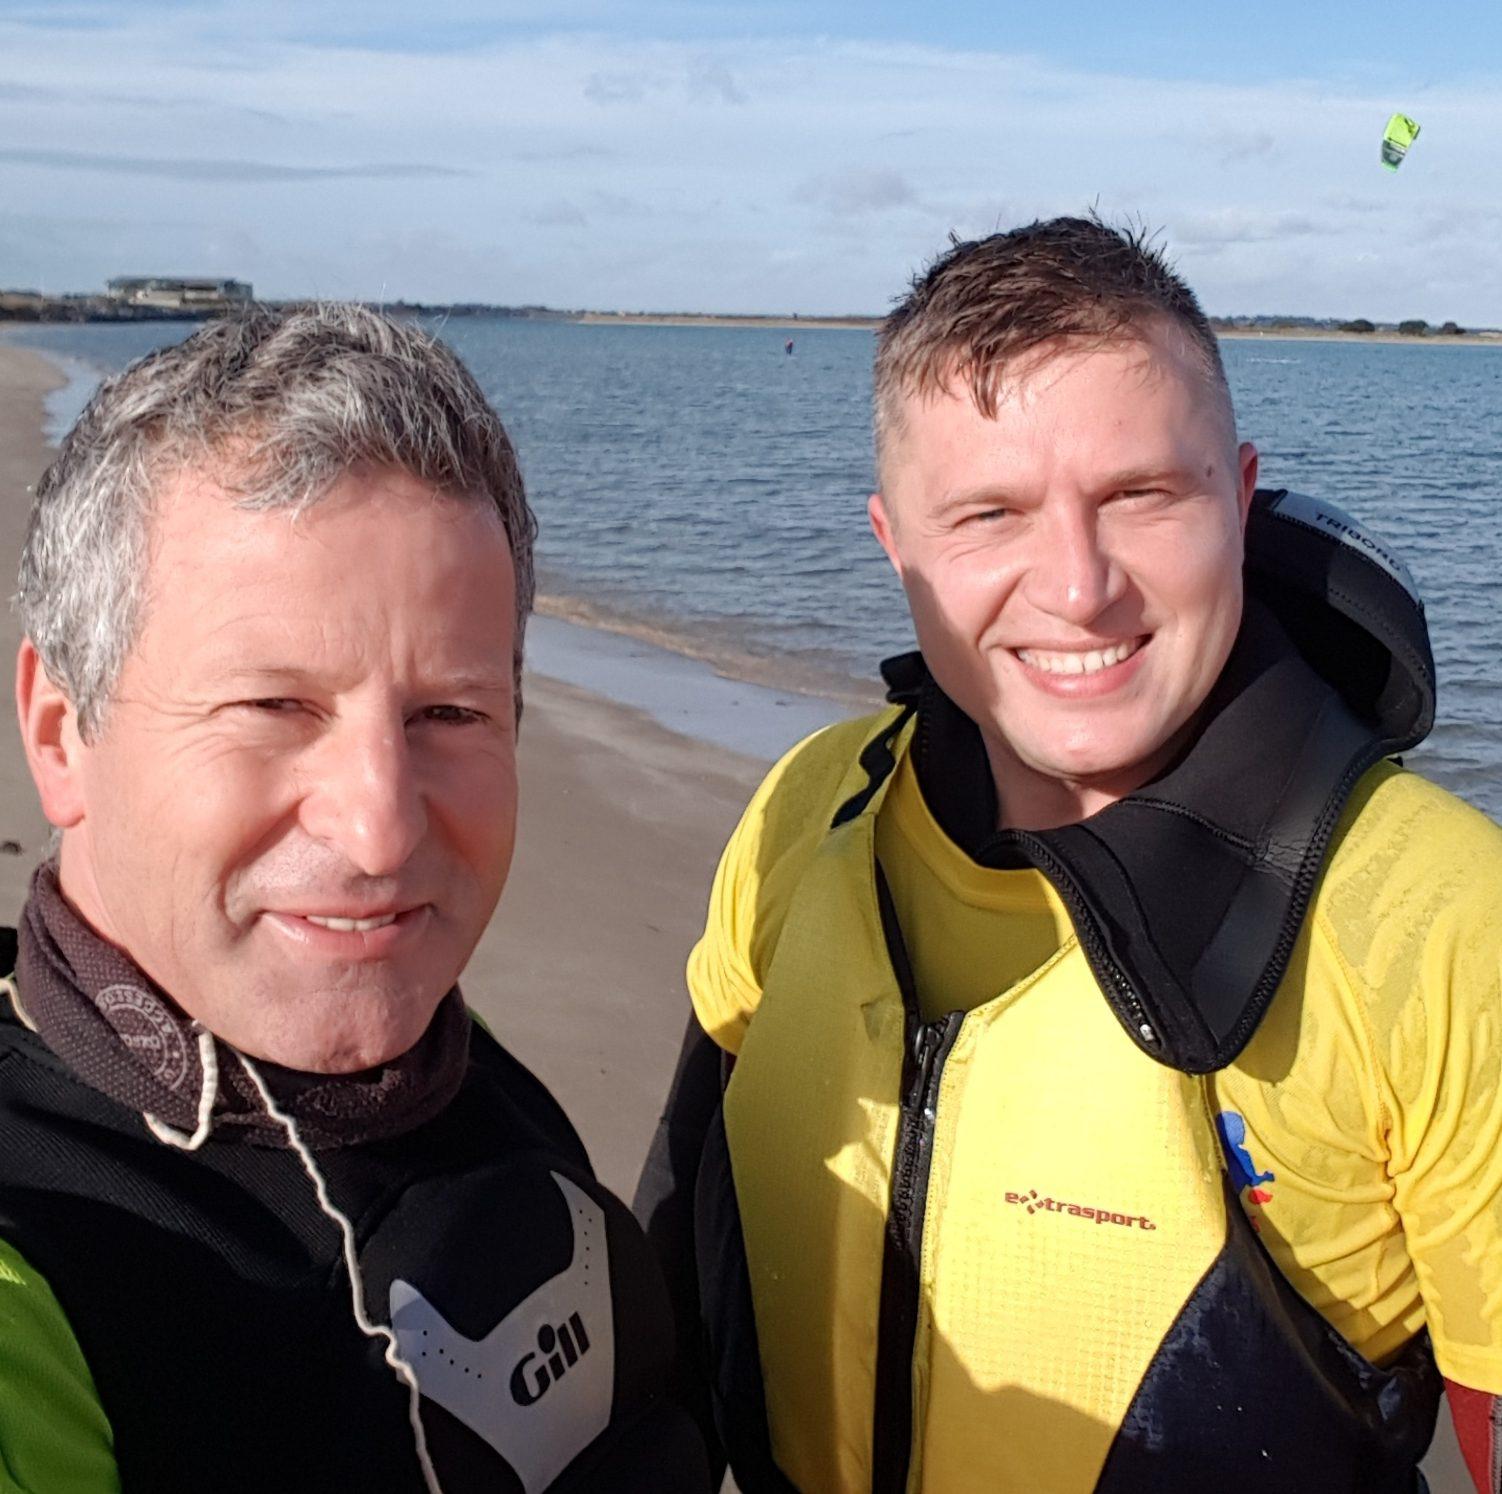 tomas kitesurfing dublin